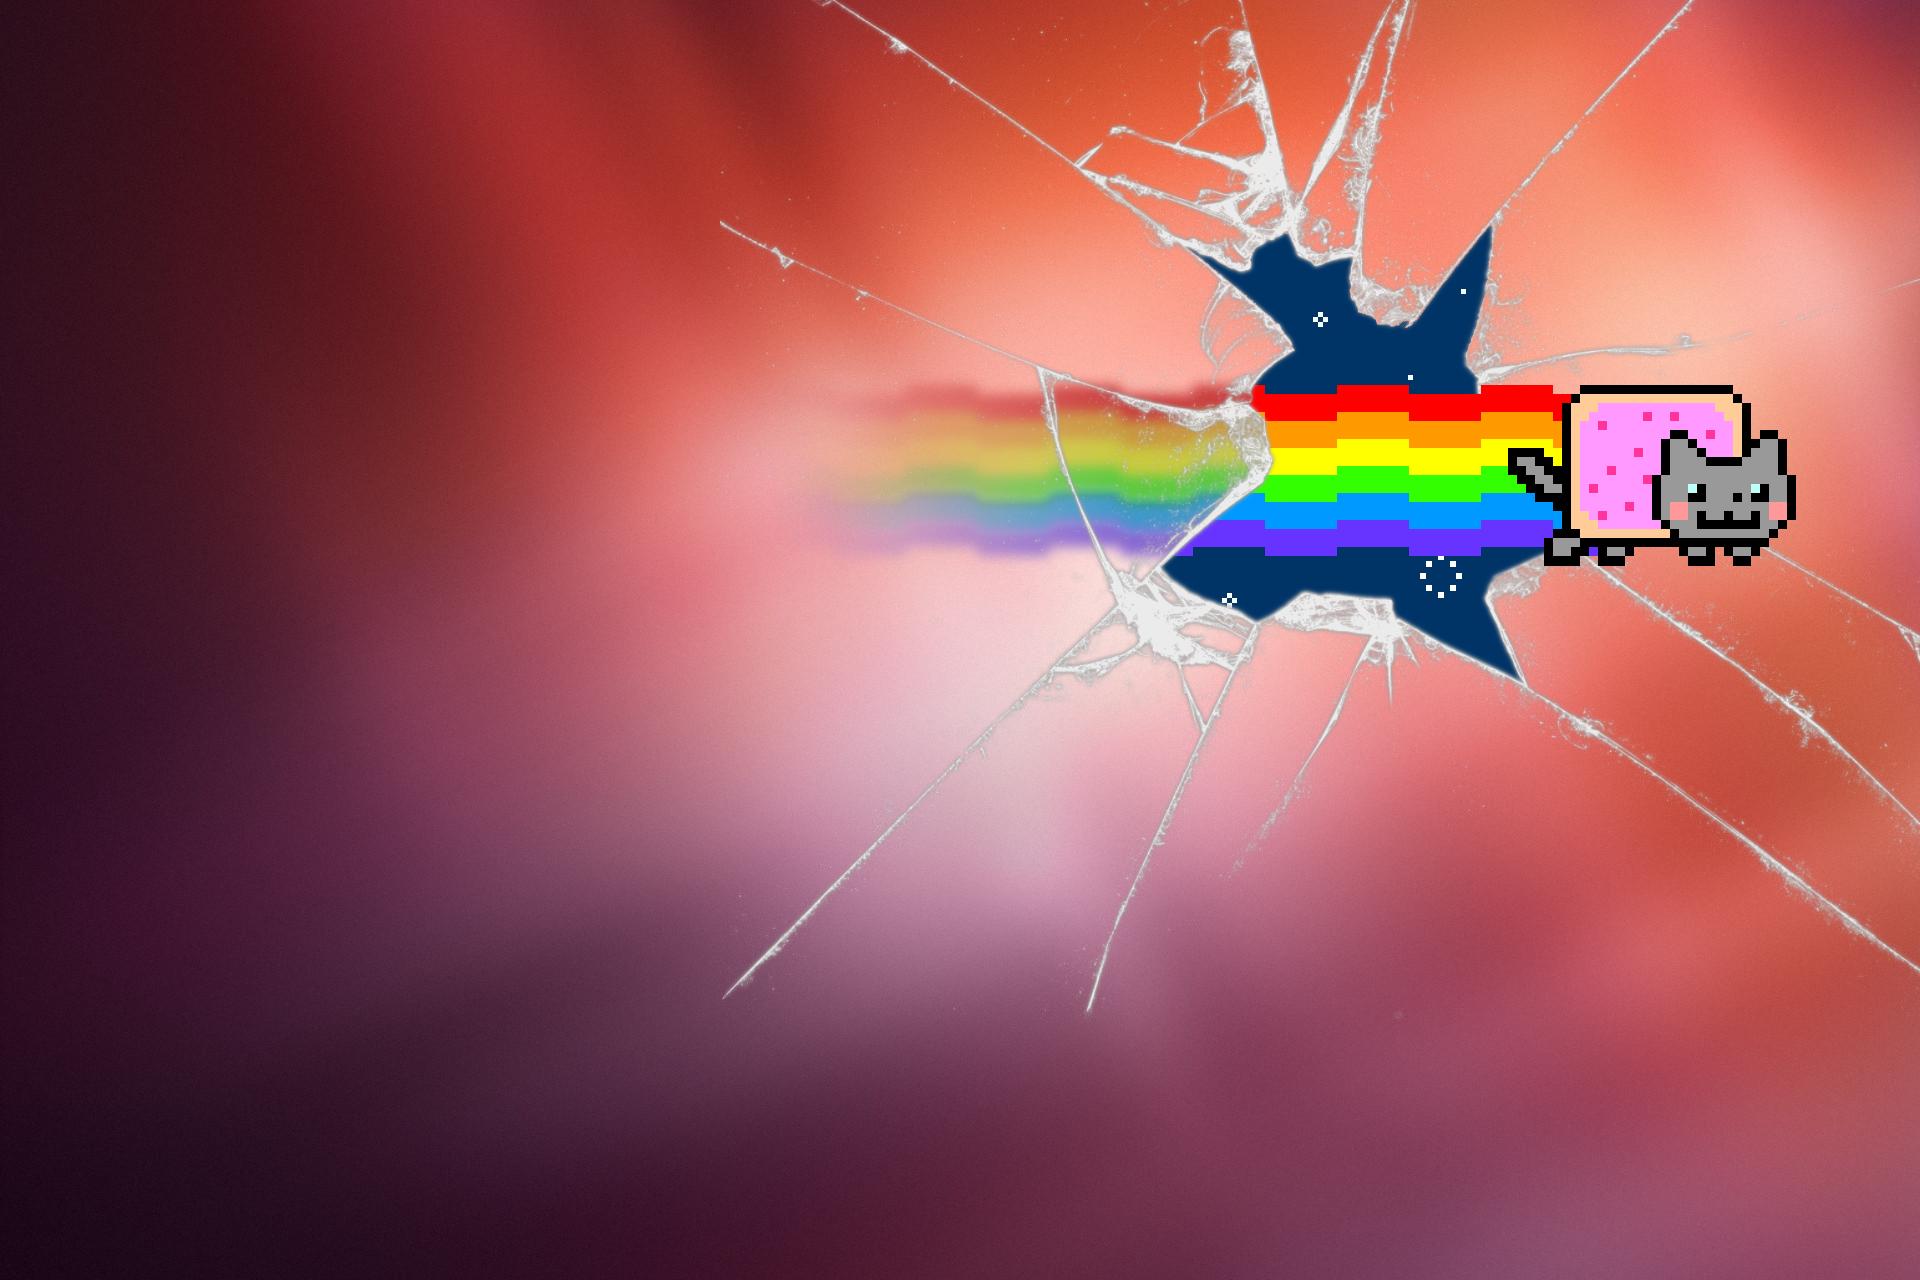 ''Nyan Cat Precise'' Wallpaper by Jayro-Jones